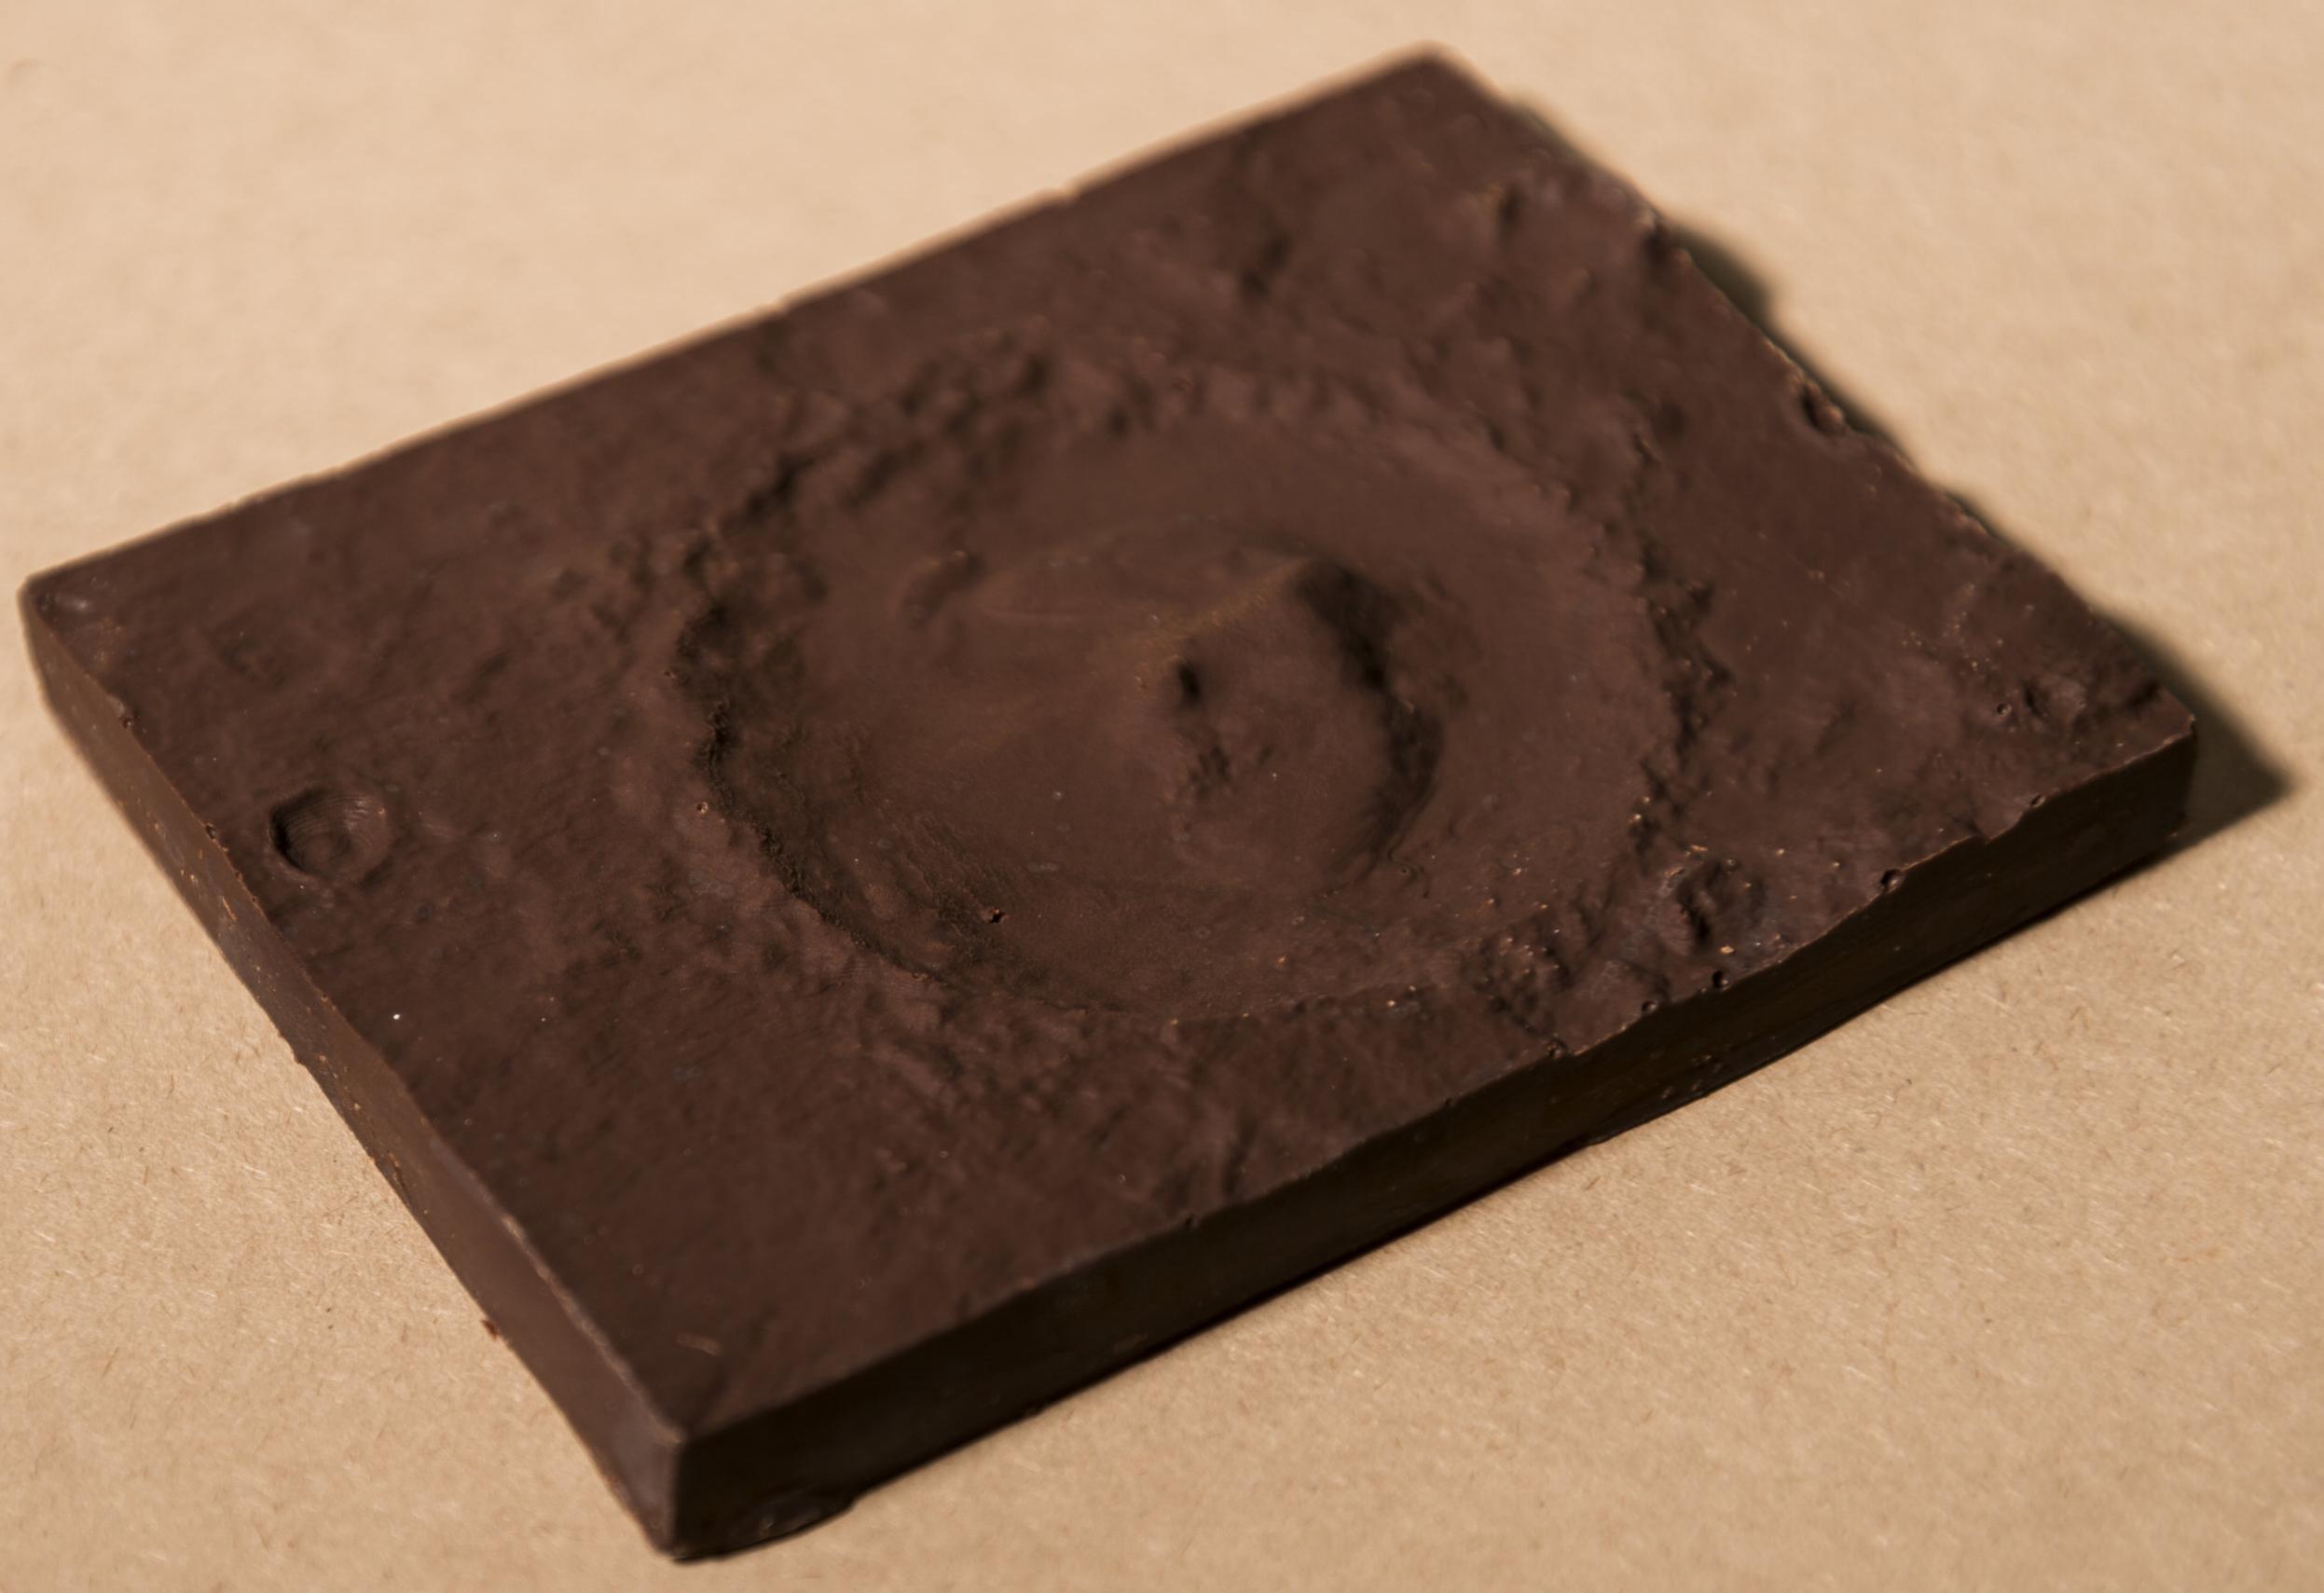 Chocolate bar .jpg